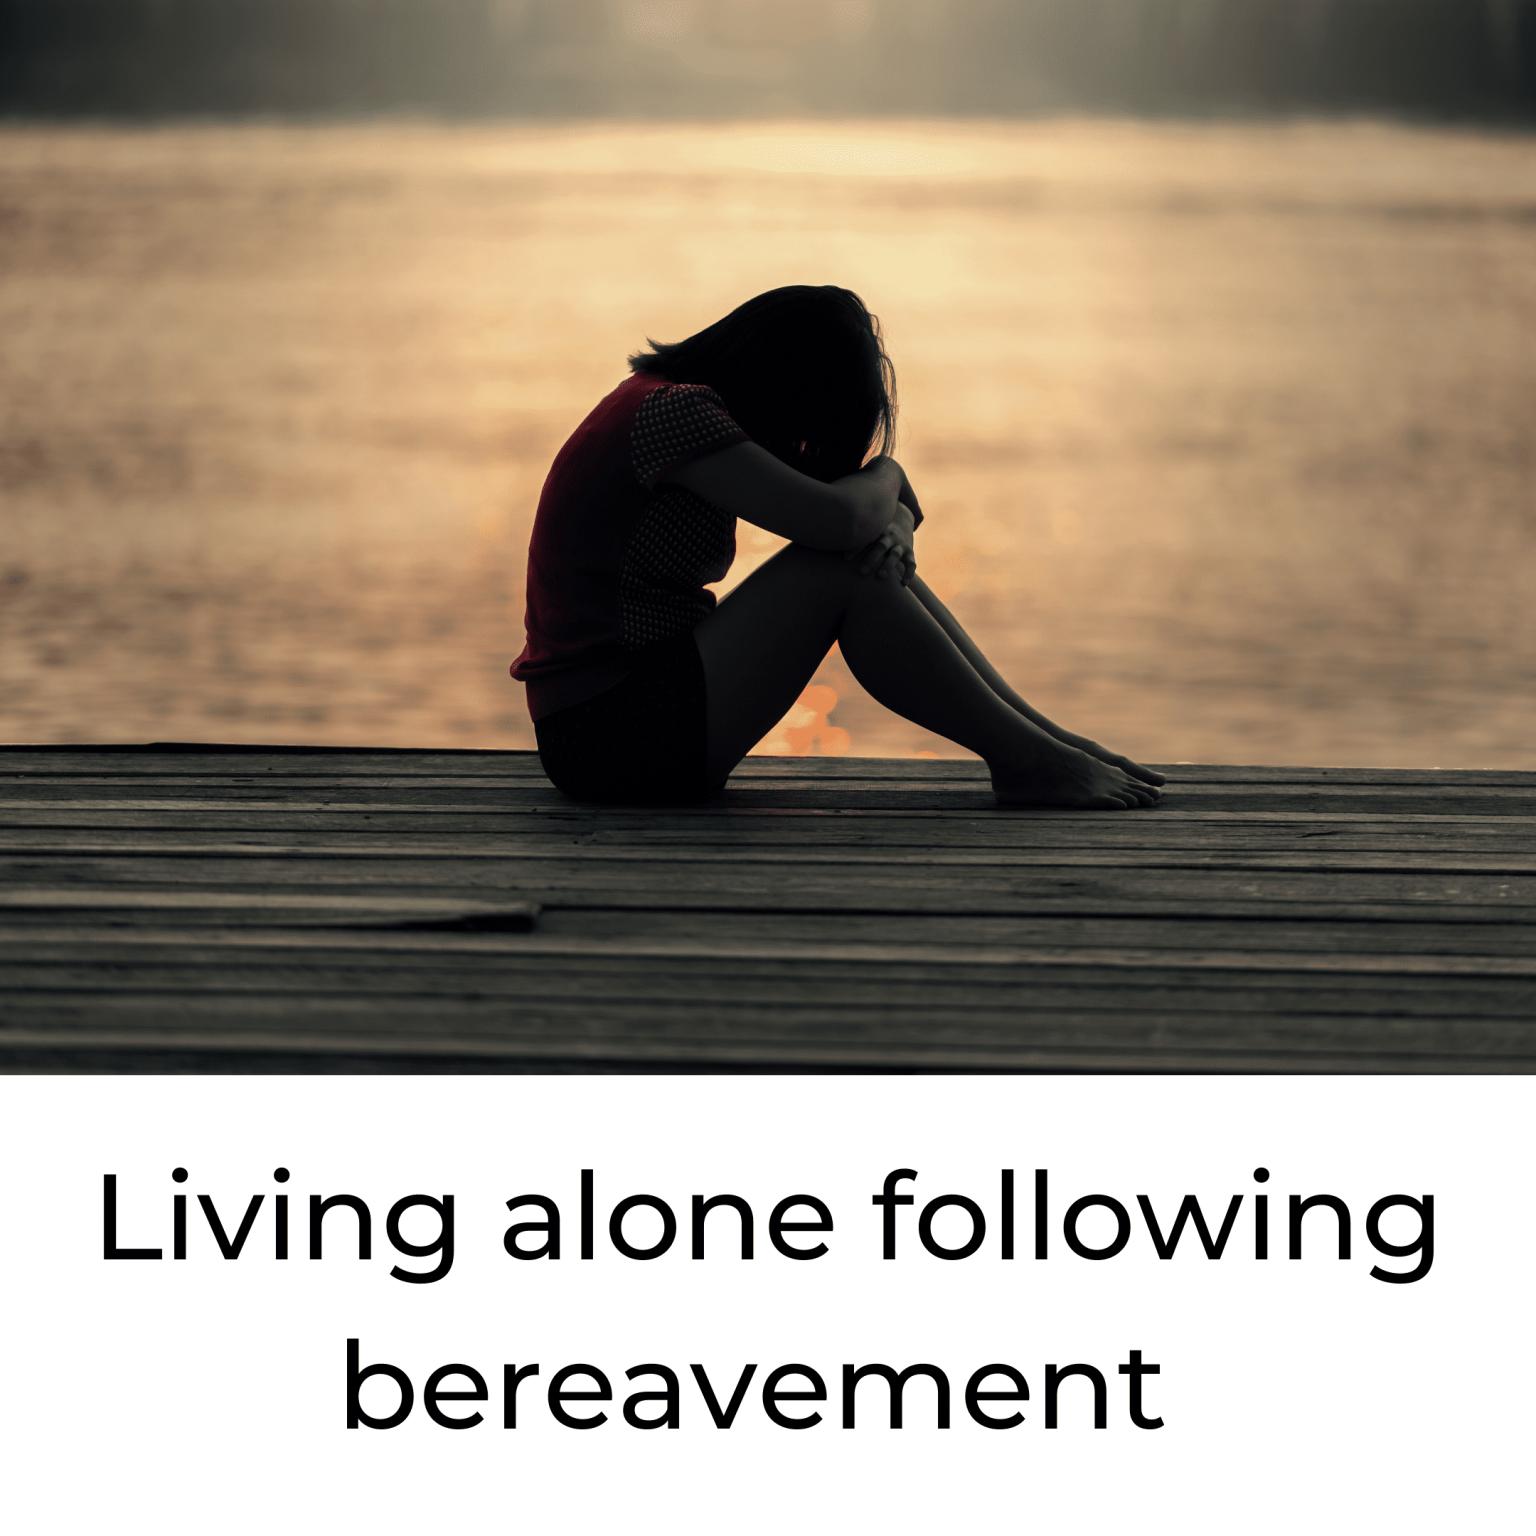 living alone following bereavement